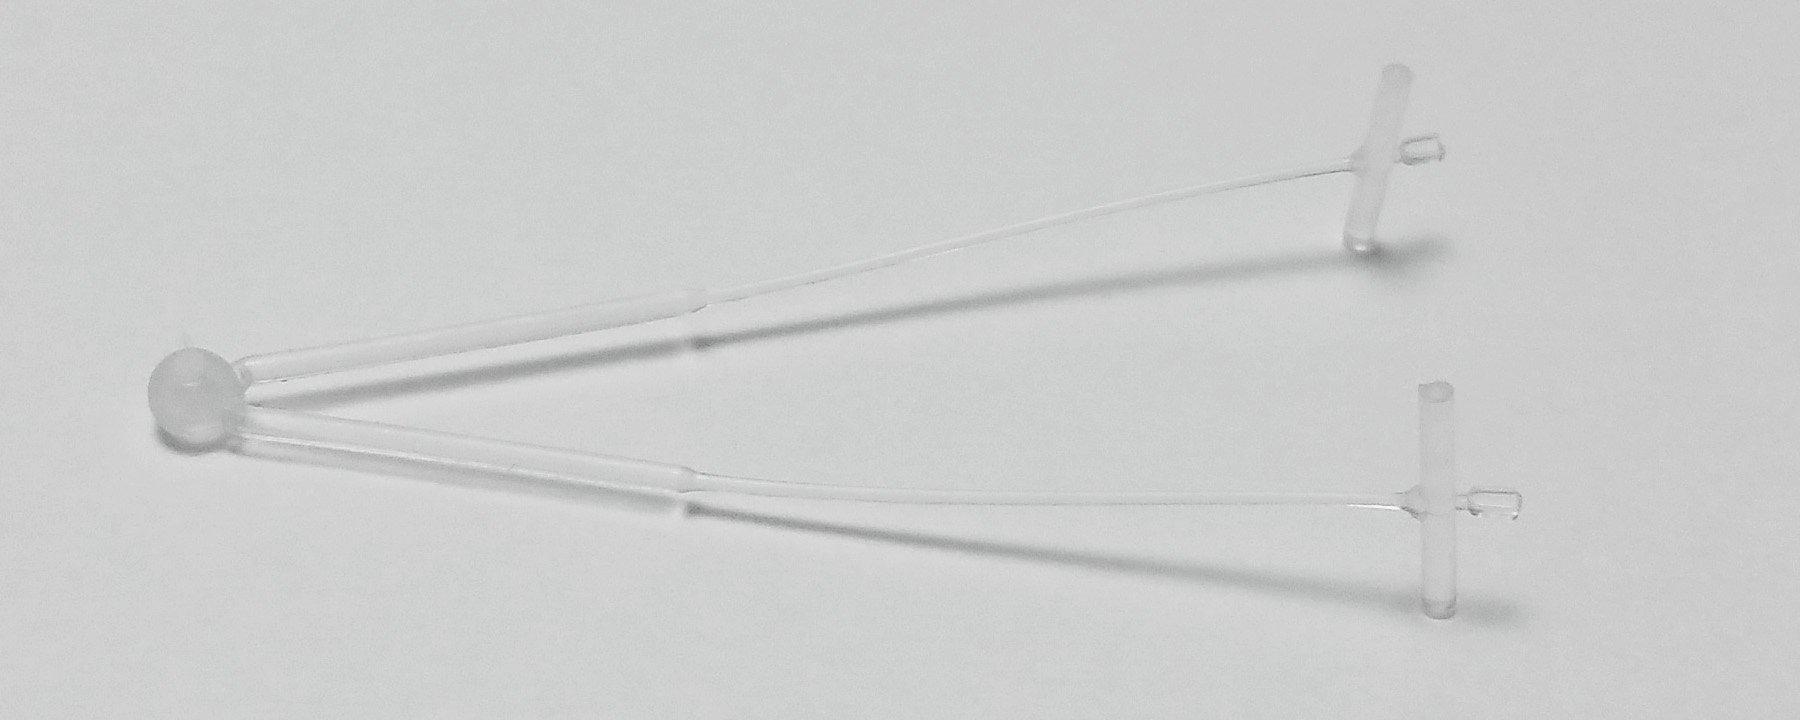 Amram 1 1/2 Inch Standard Loop Tagging Attachments 5000 Pieces 50 Per Clip Natural